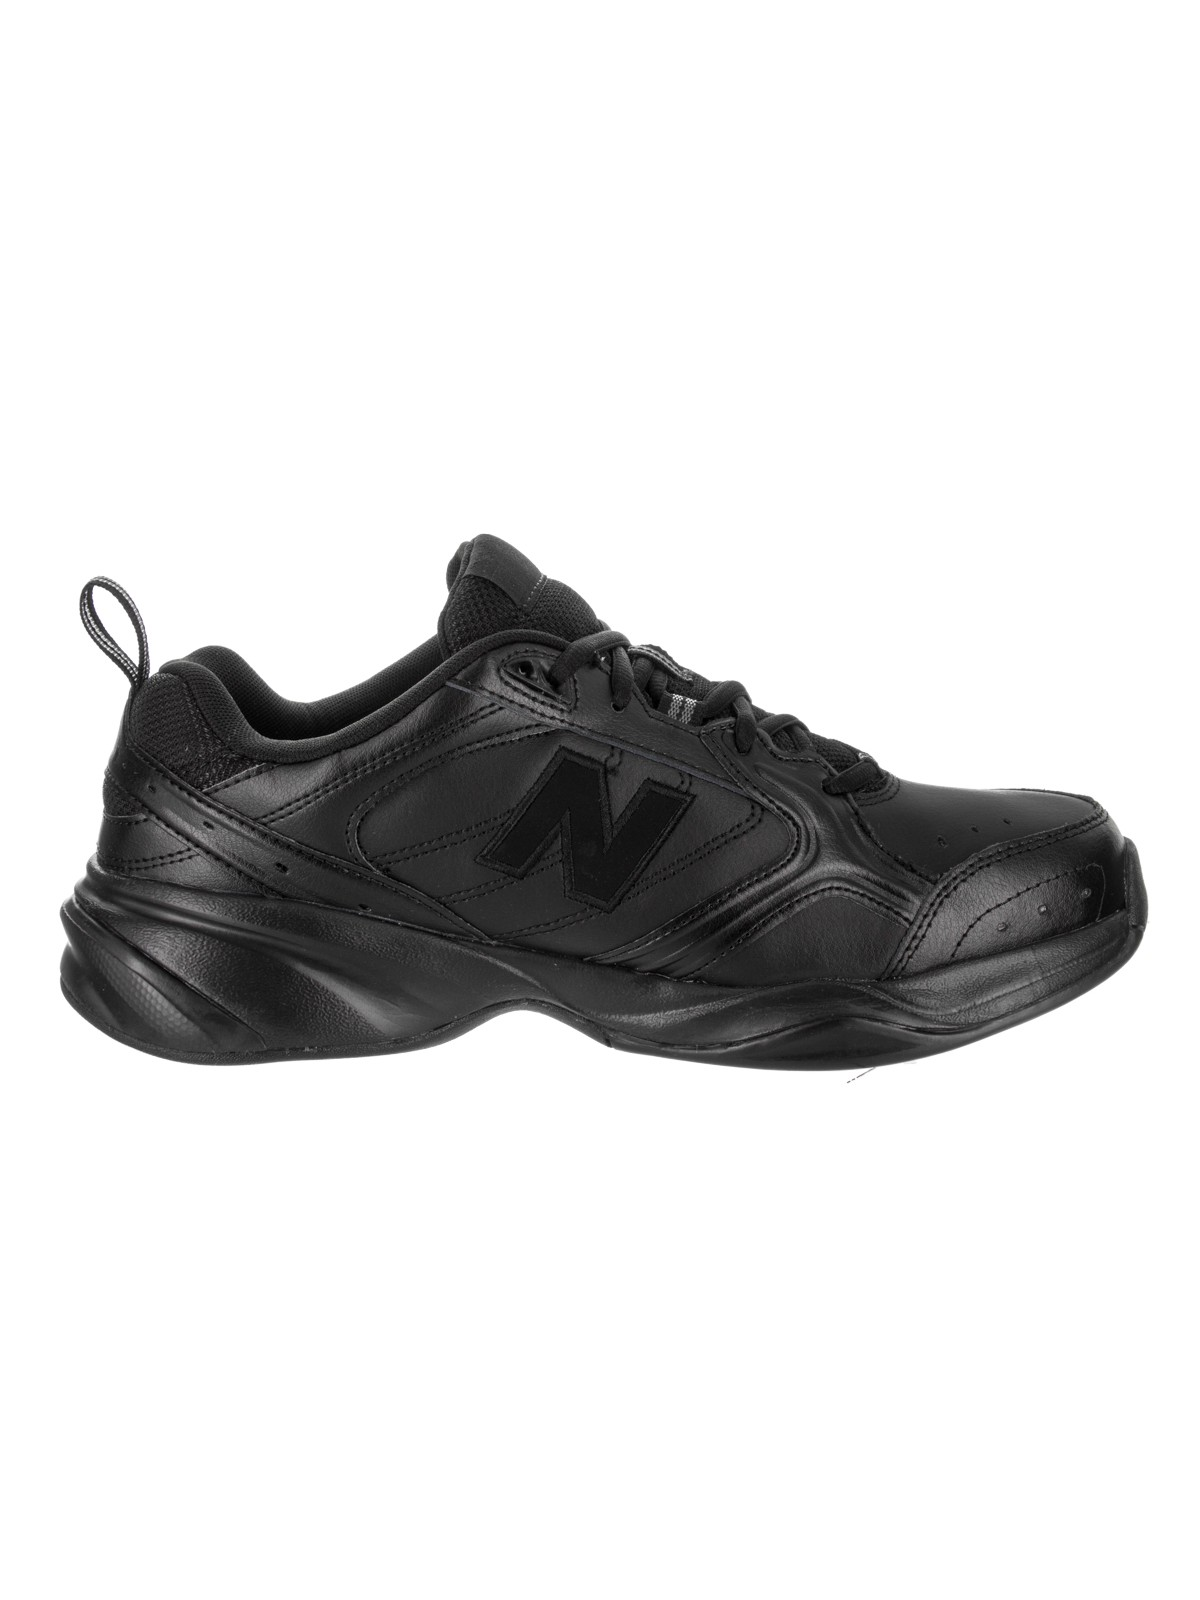 New Balance Men's MX624AB2 2E Wide Training Shoe